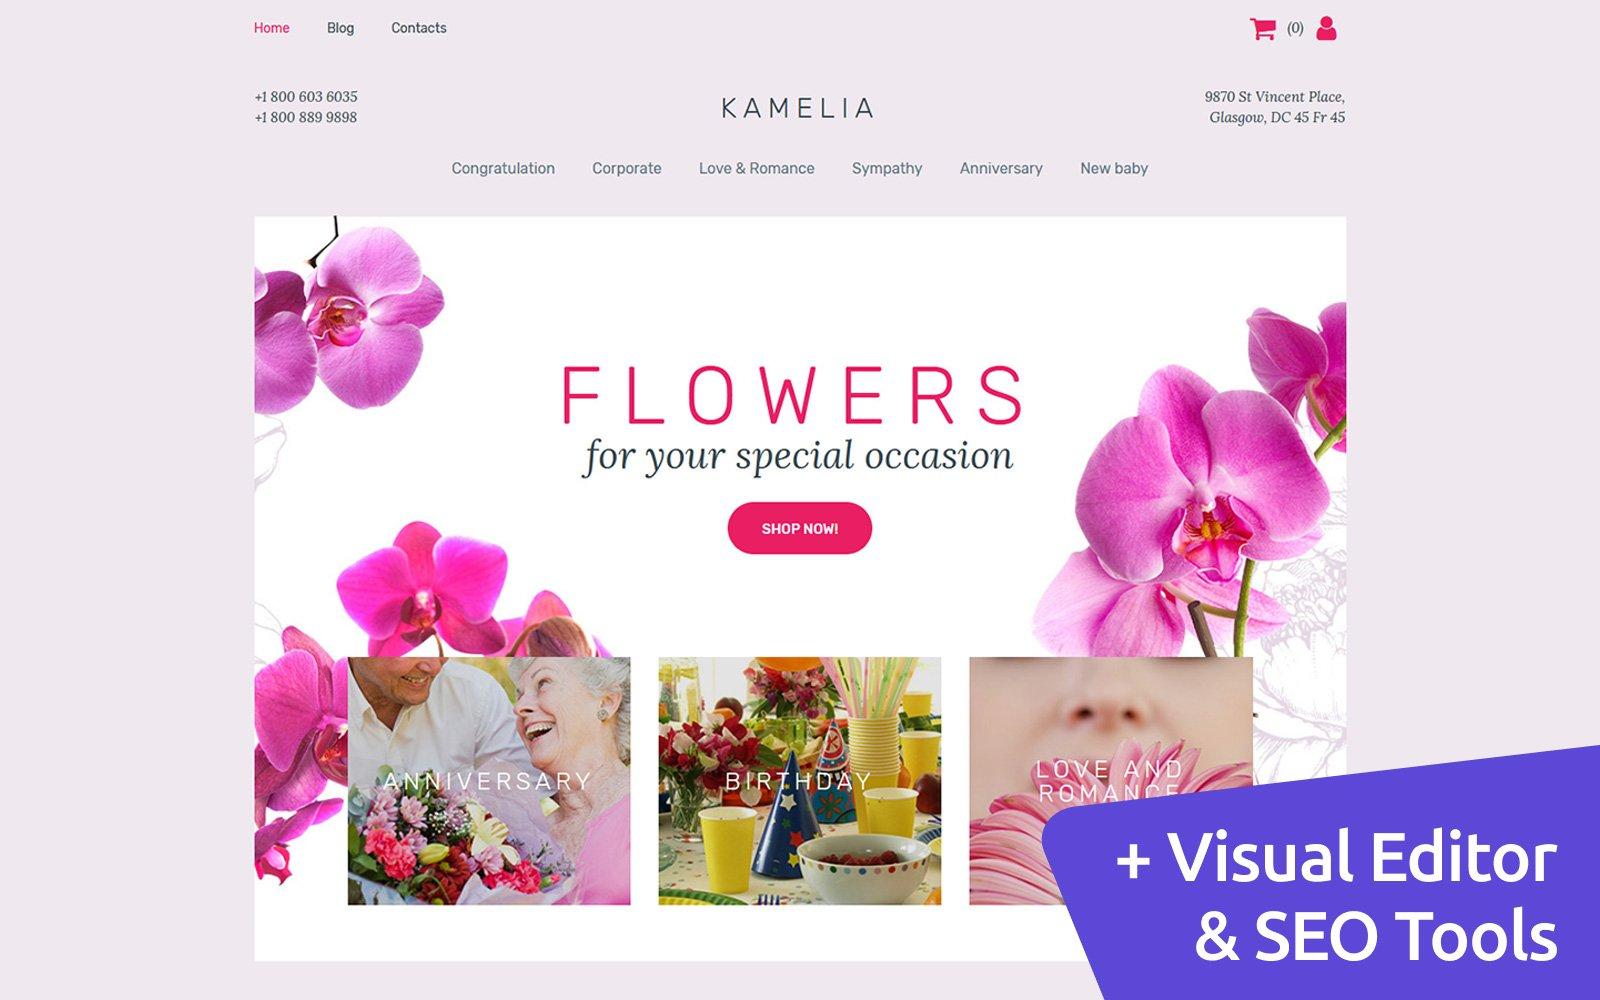 Reszponzív Kamelia - Flower Shop MotoCMS Ecommerce sablon 63718